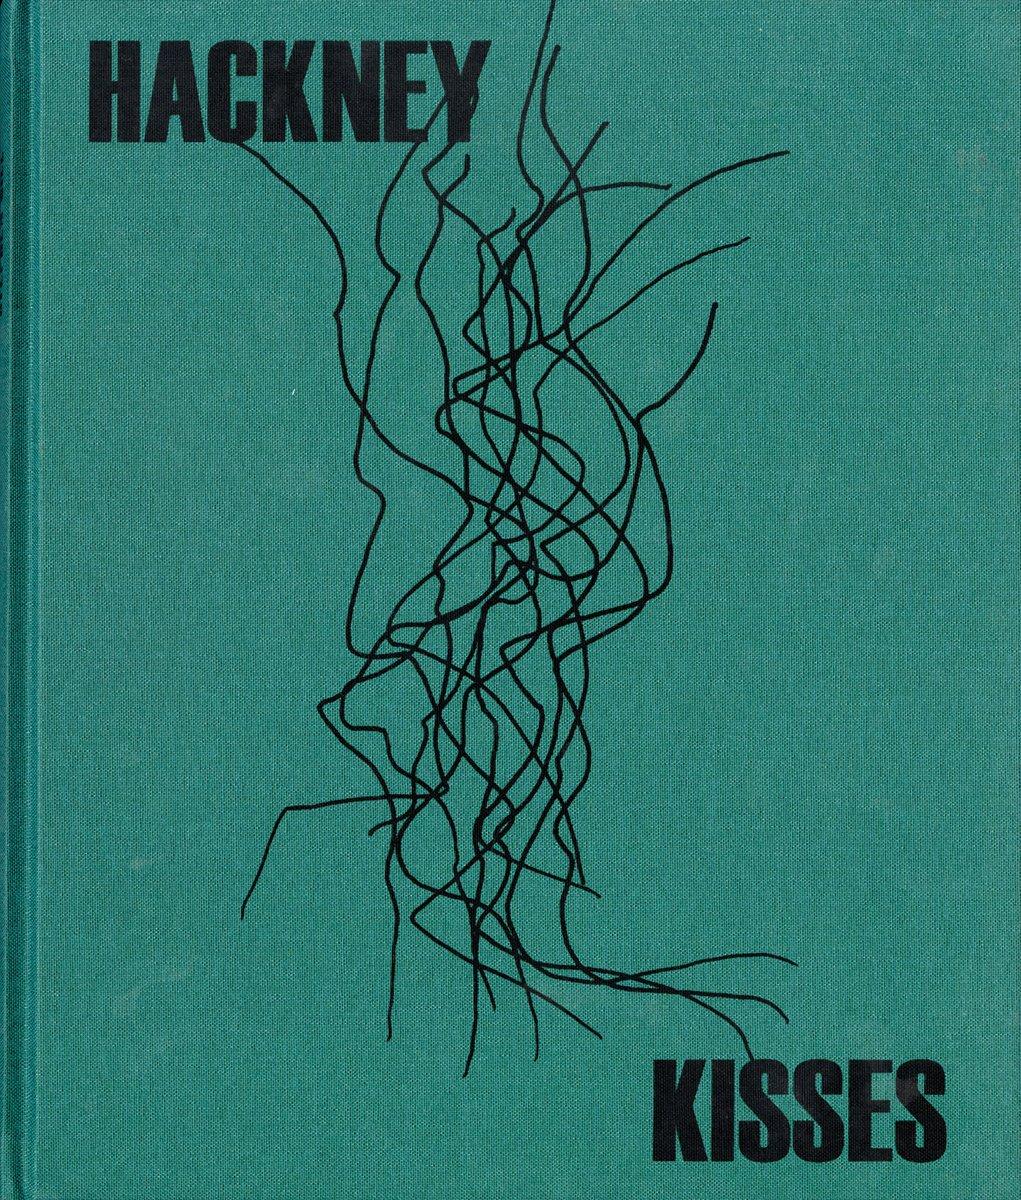 Stephen Gill: Hackney Kisses